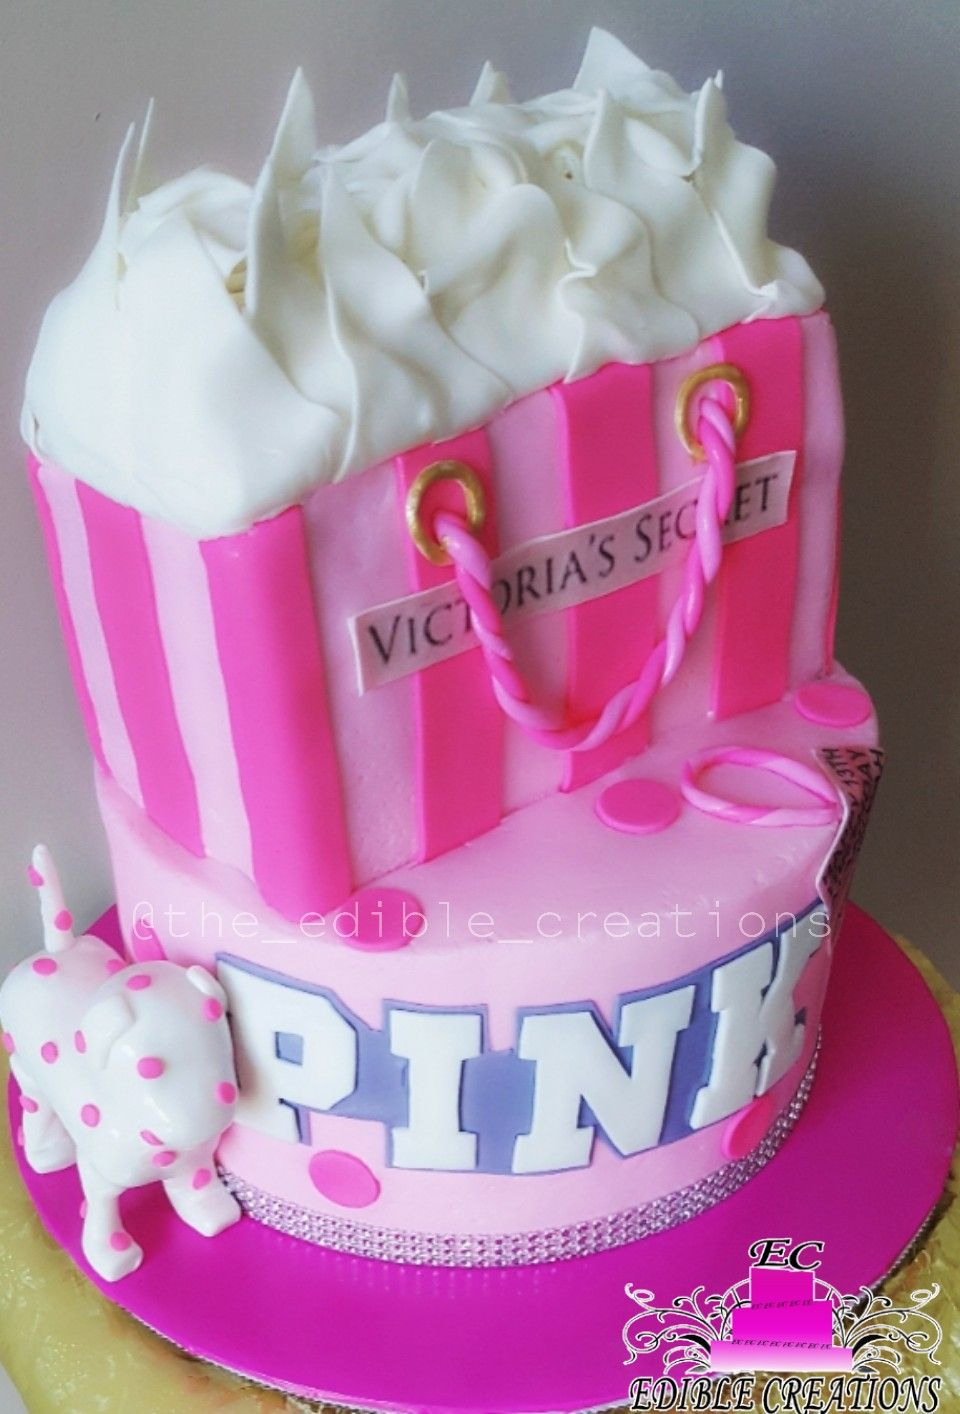 Victorias secret pink cake edible creations pink cake